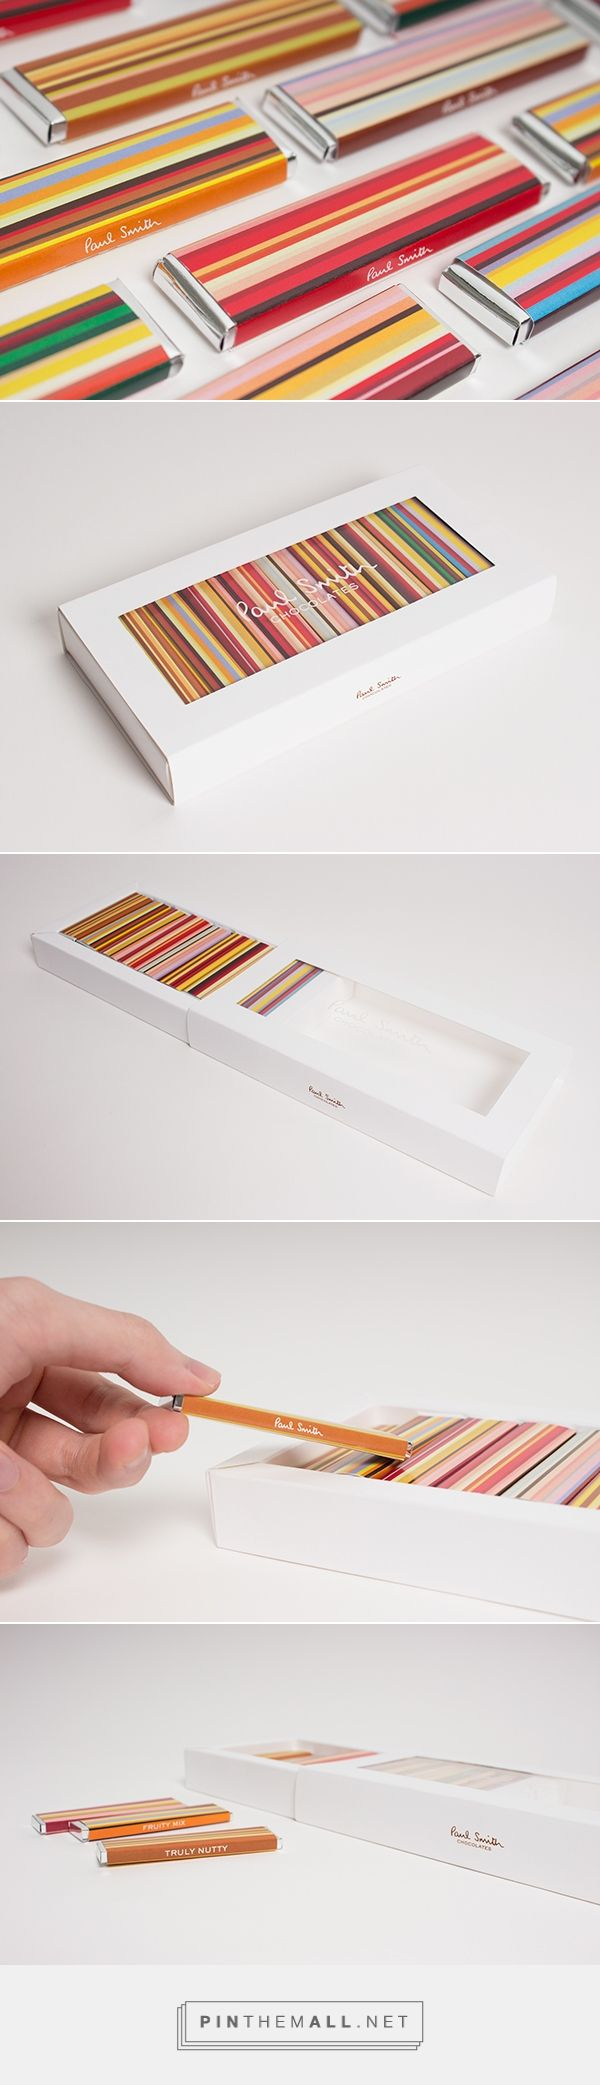 Paul Smith Chocolates by Siow Jun